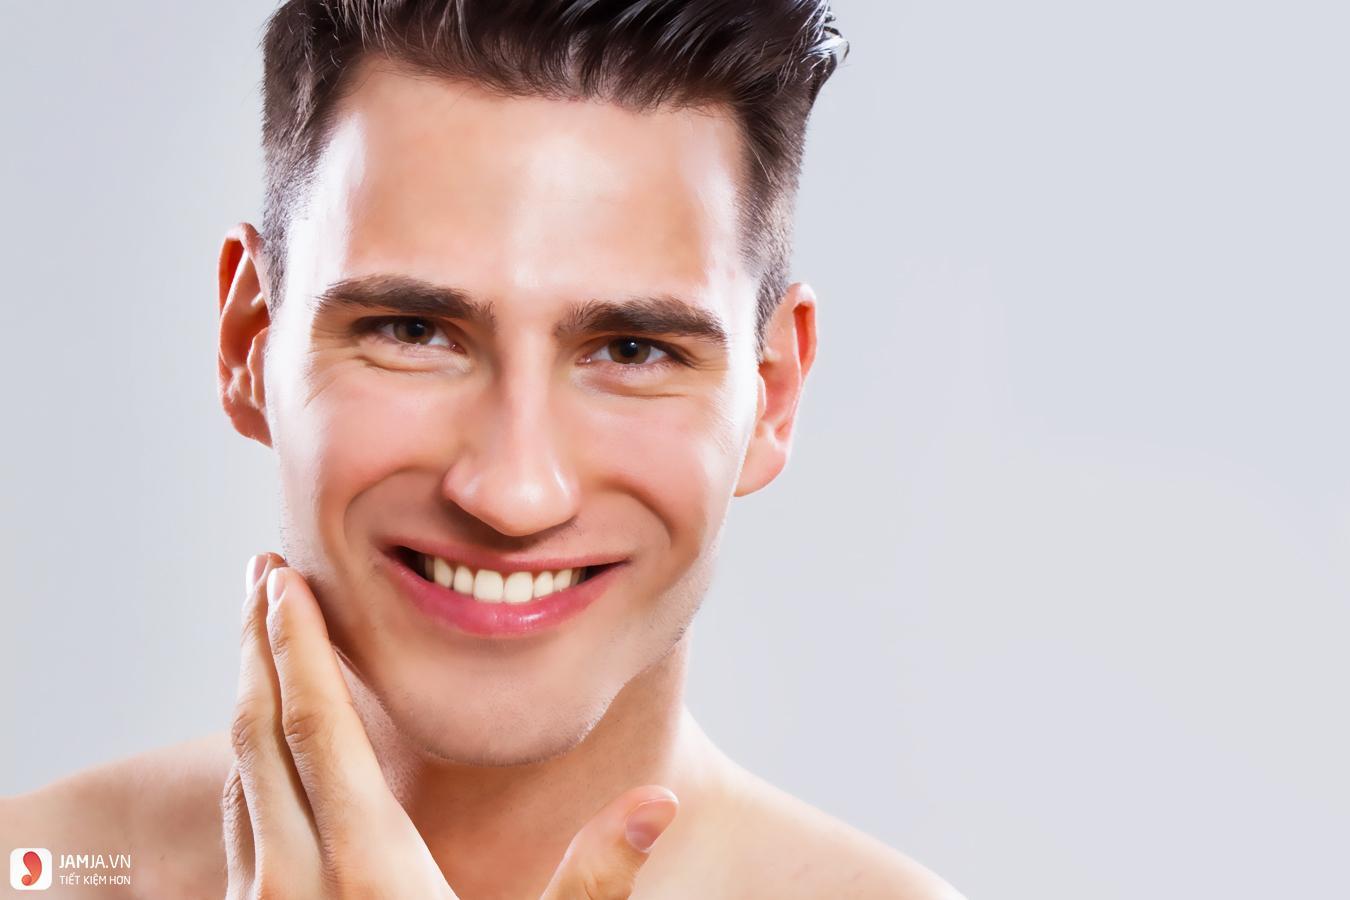 Sự khác nhau giữa làn da của nam giới và nữ giới